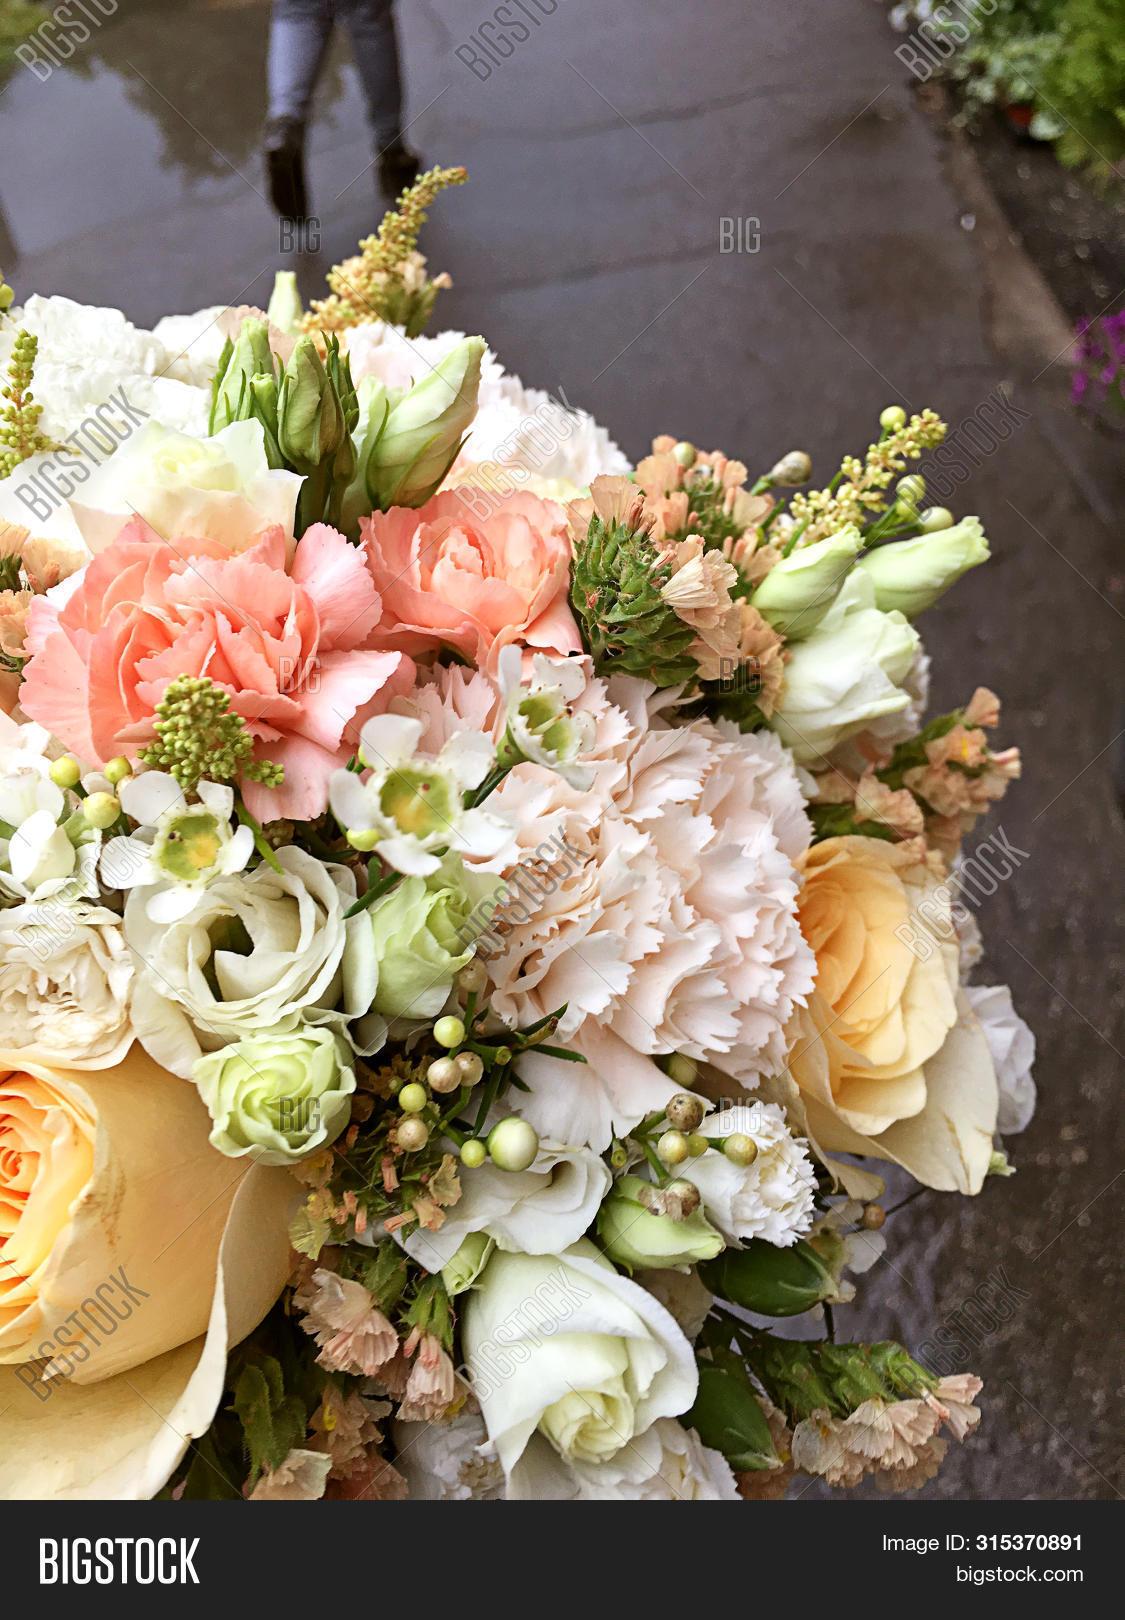 Wedding Bouquet Fresh Image Photo Free Trial Bigstock